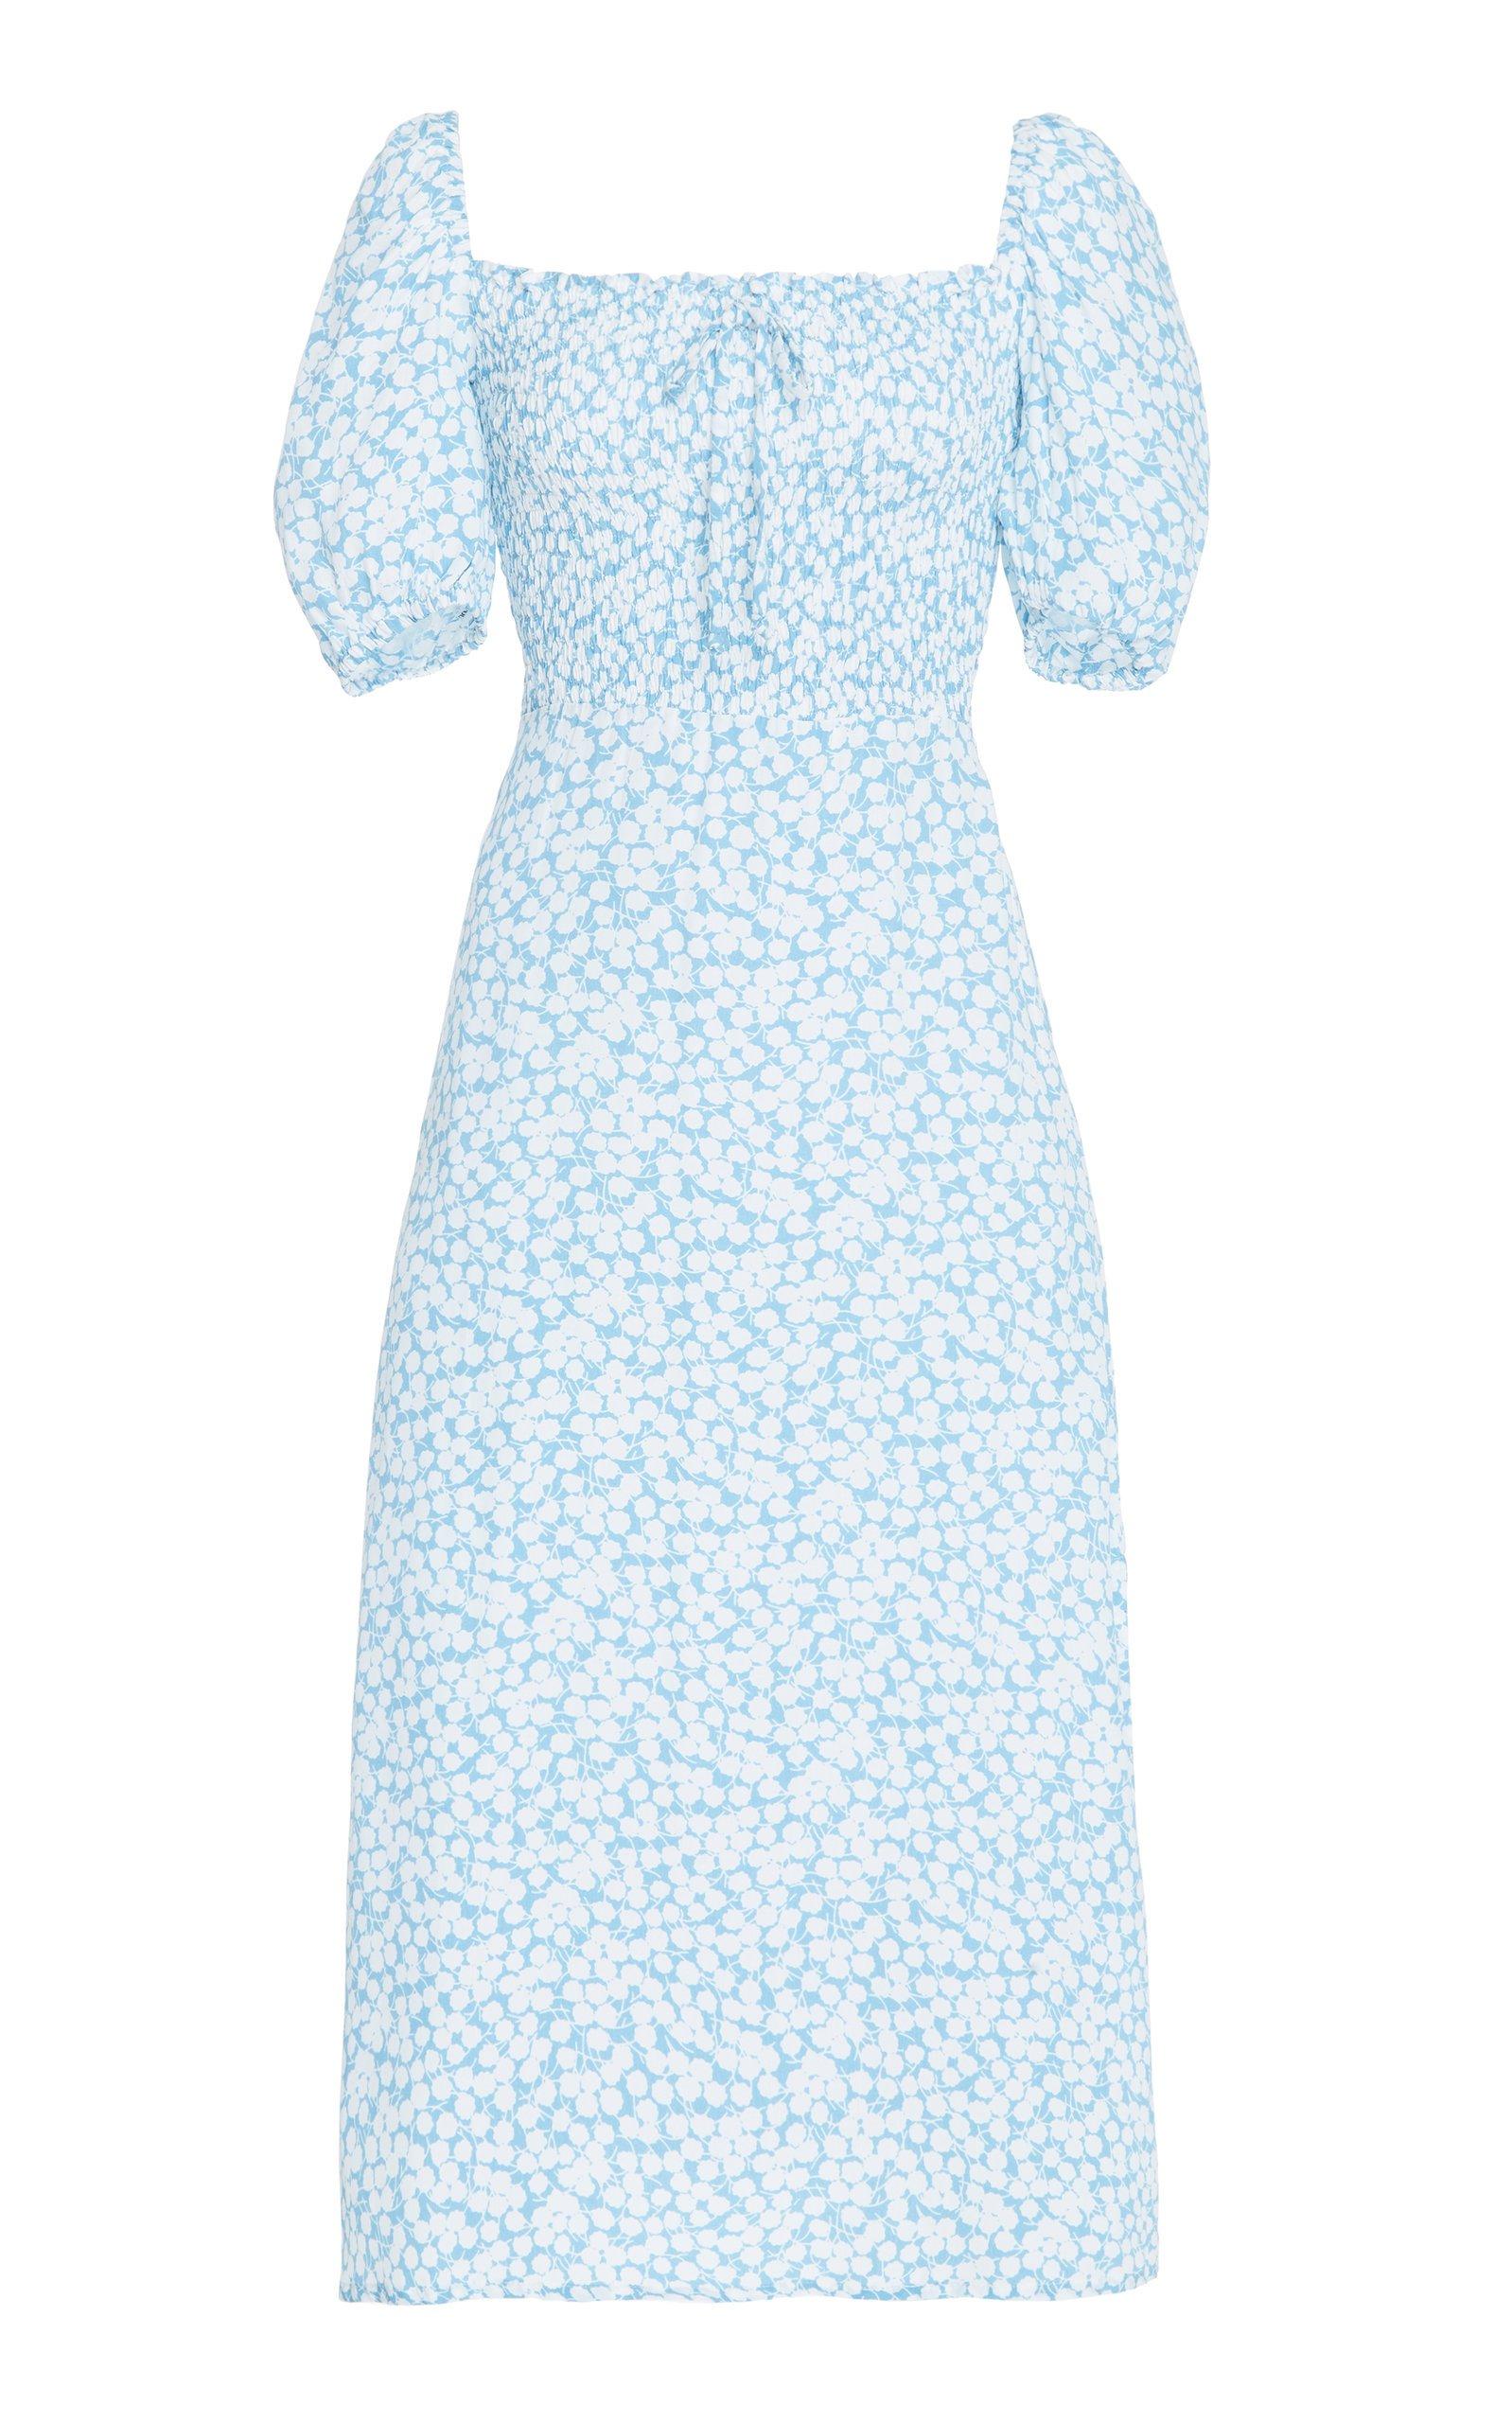 Faithfull The Brand Majorelle Floral-Print Crepe Midi Dress